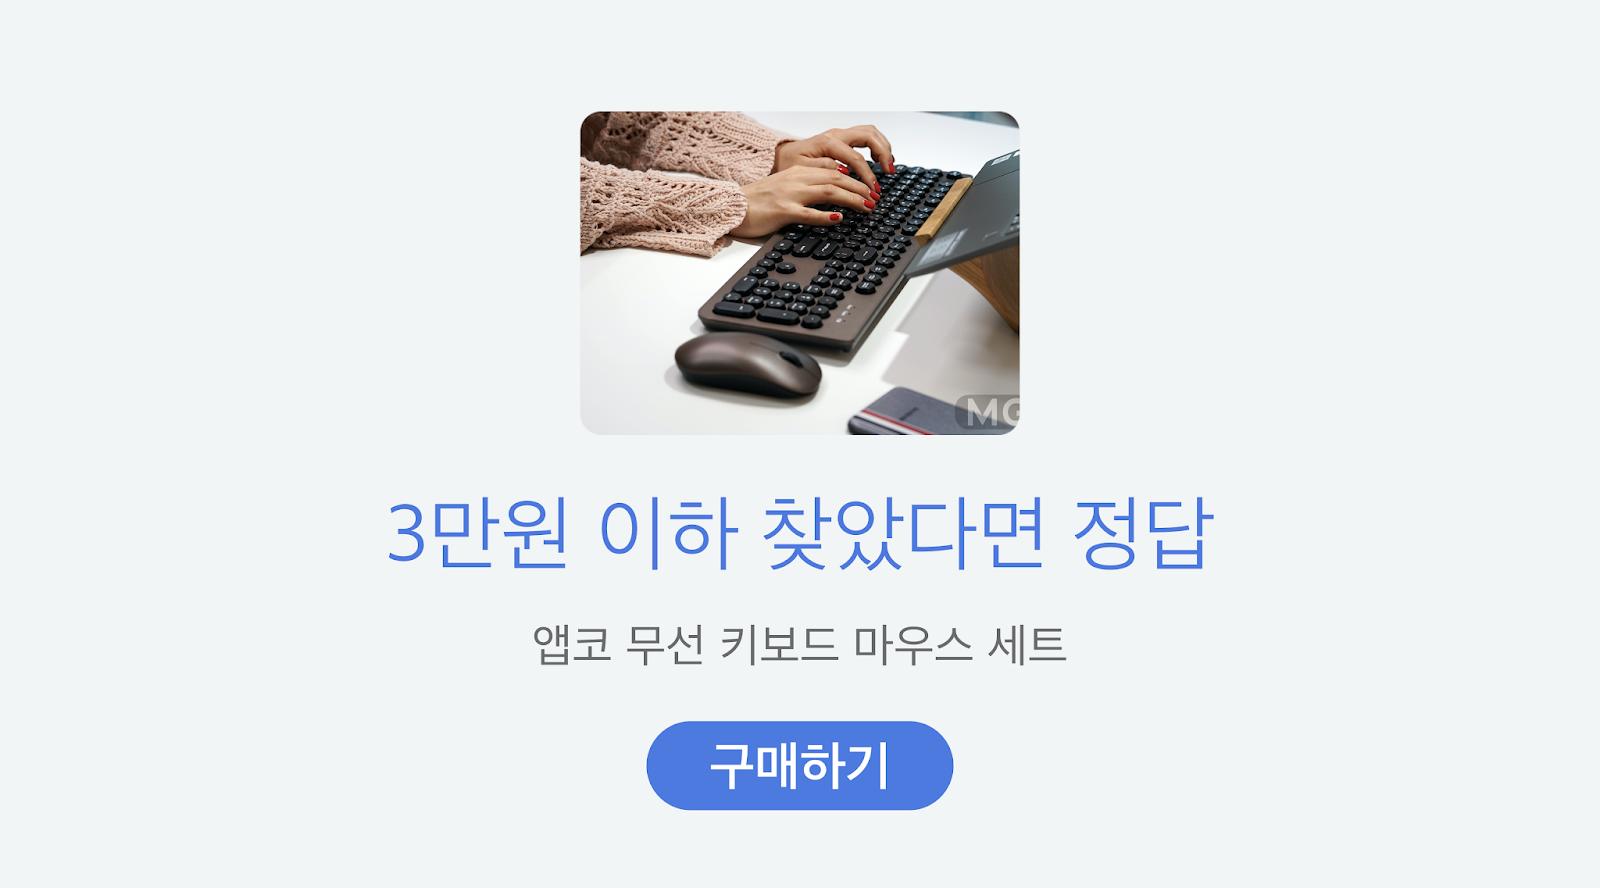 http://prod.danawa.com/info/?pcode=9267093